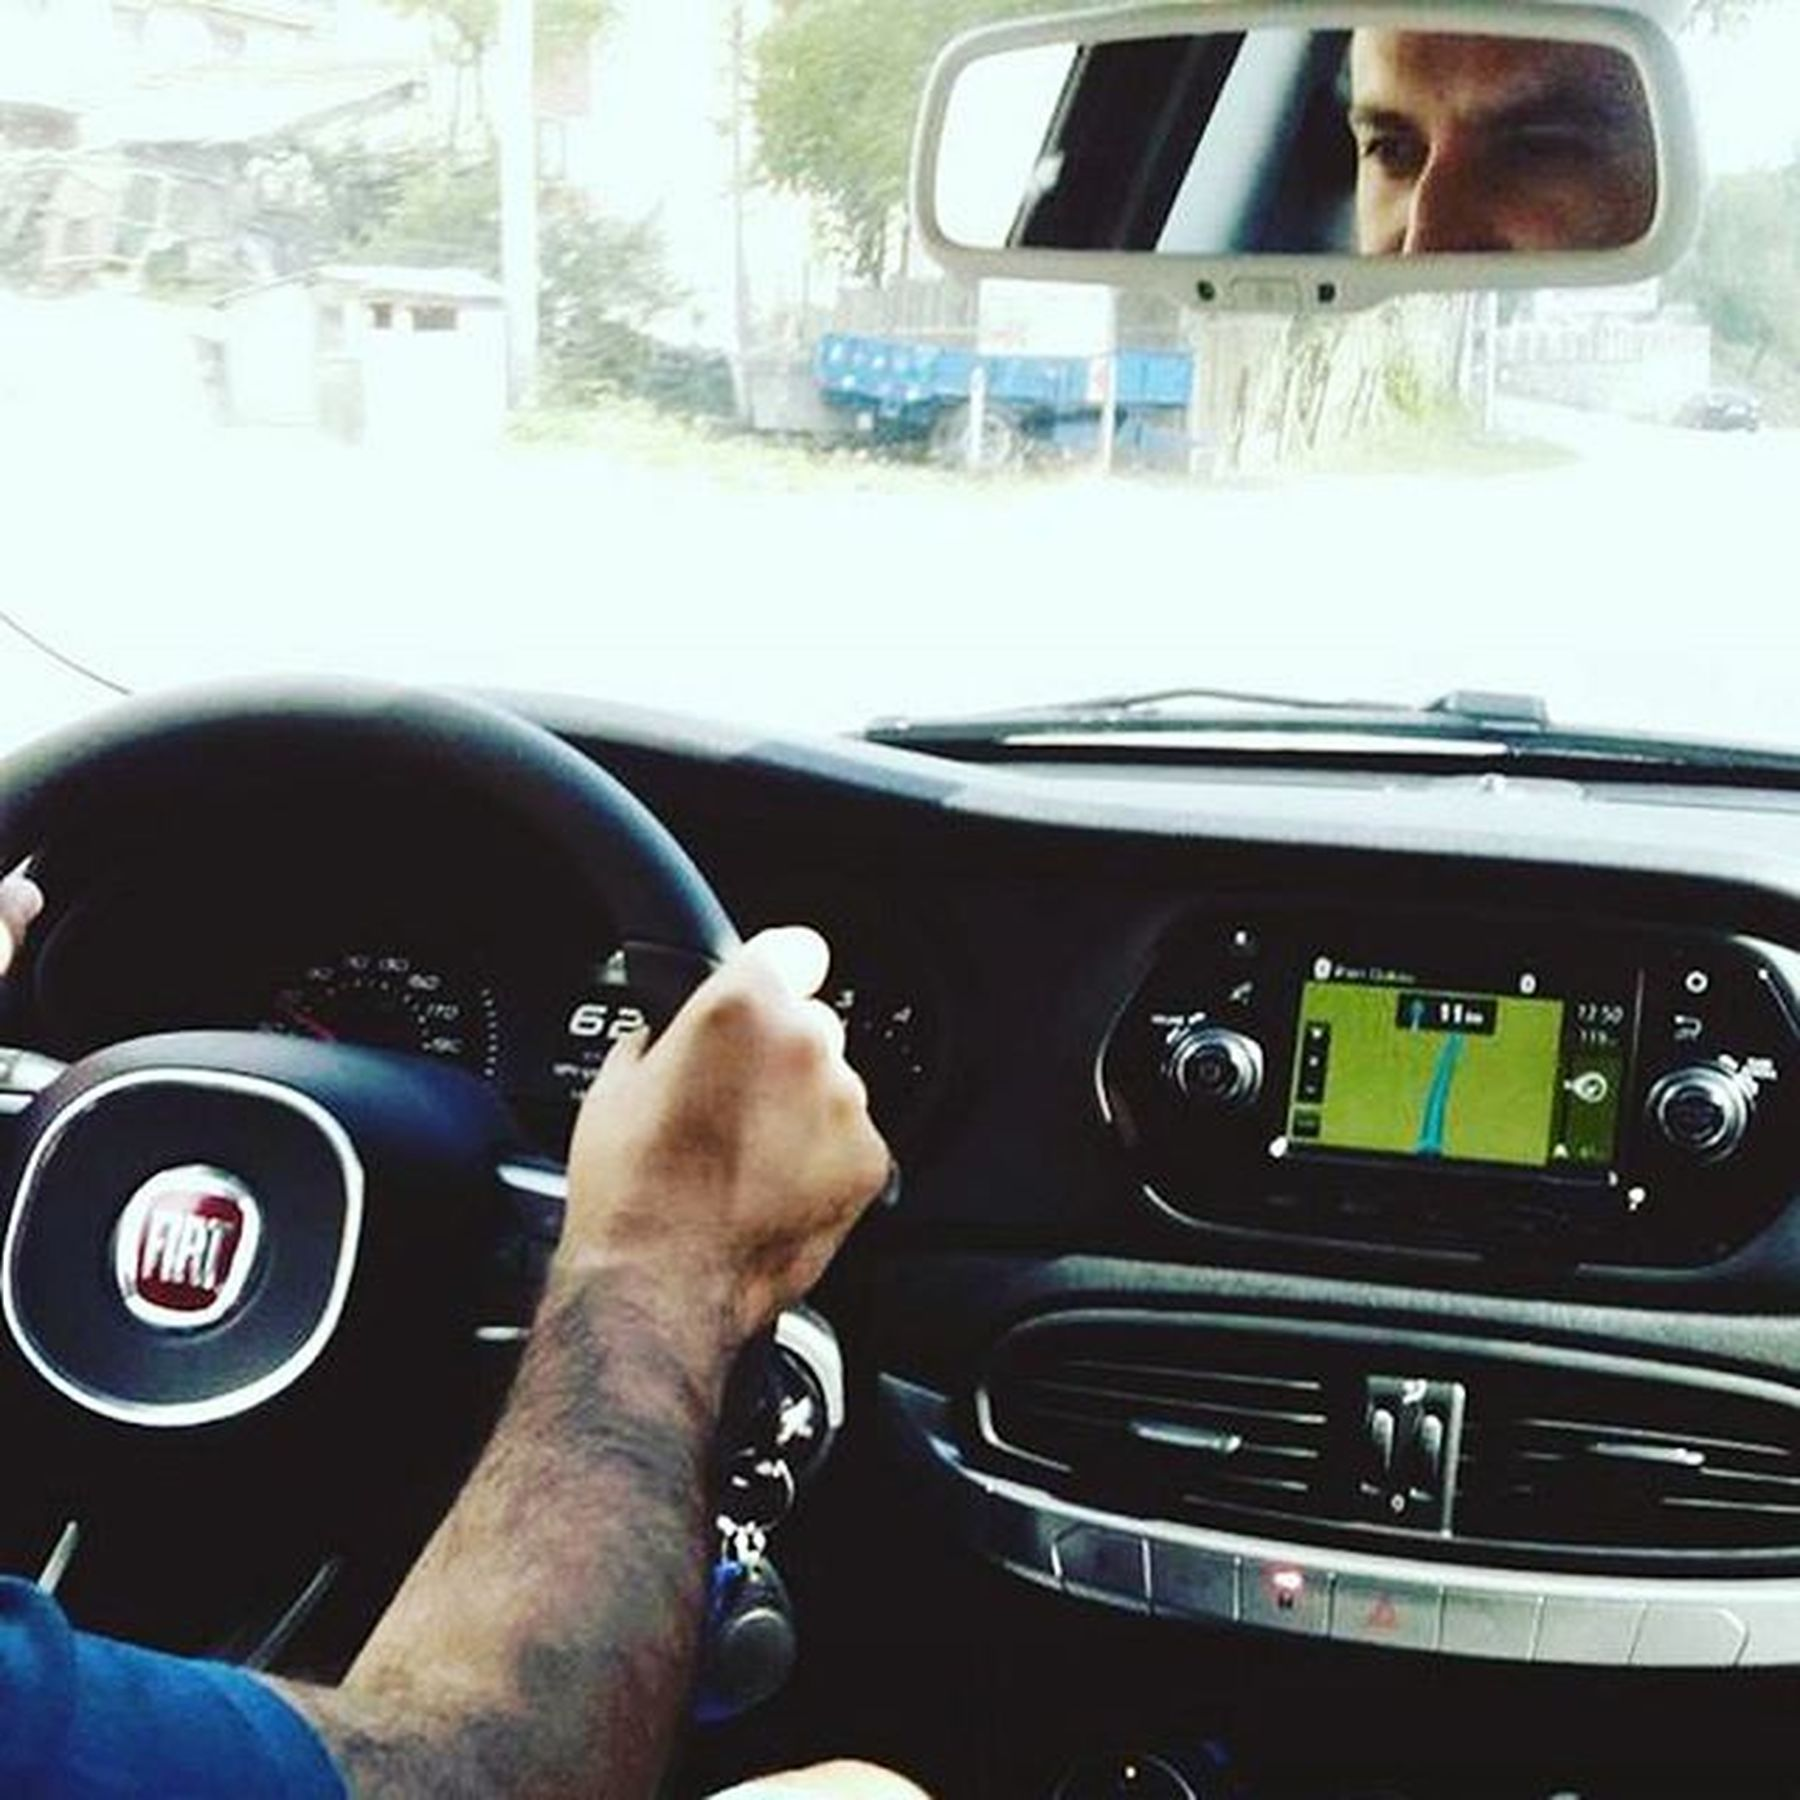 Fiat Egea Test Sürüşünde. Fiategea Fiat Testsürüşü Kokpit